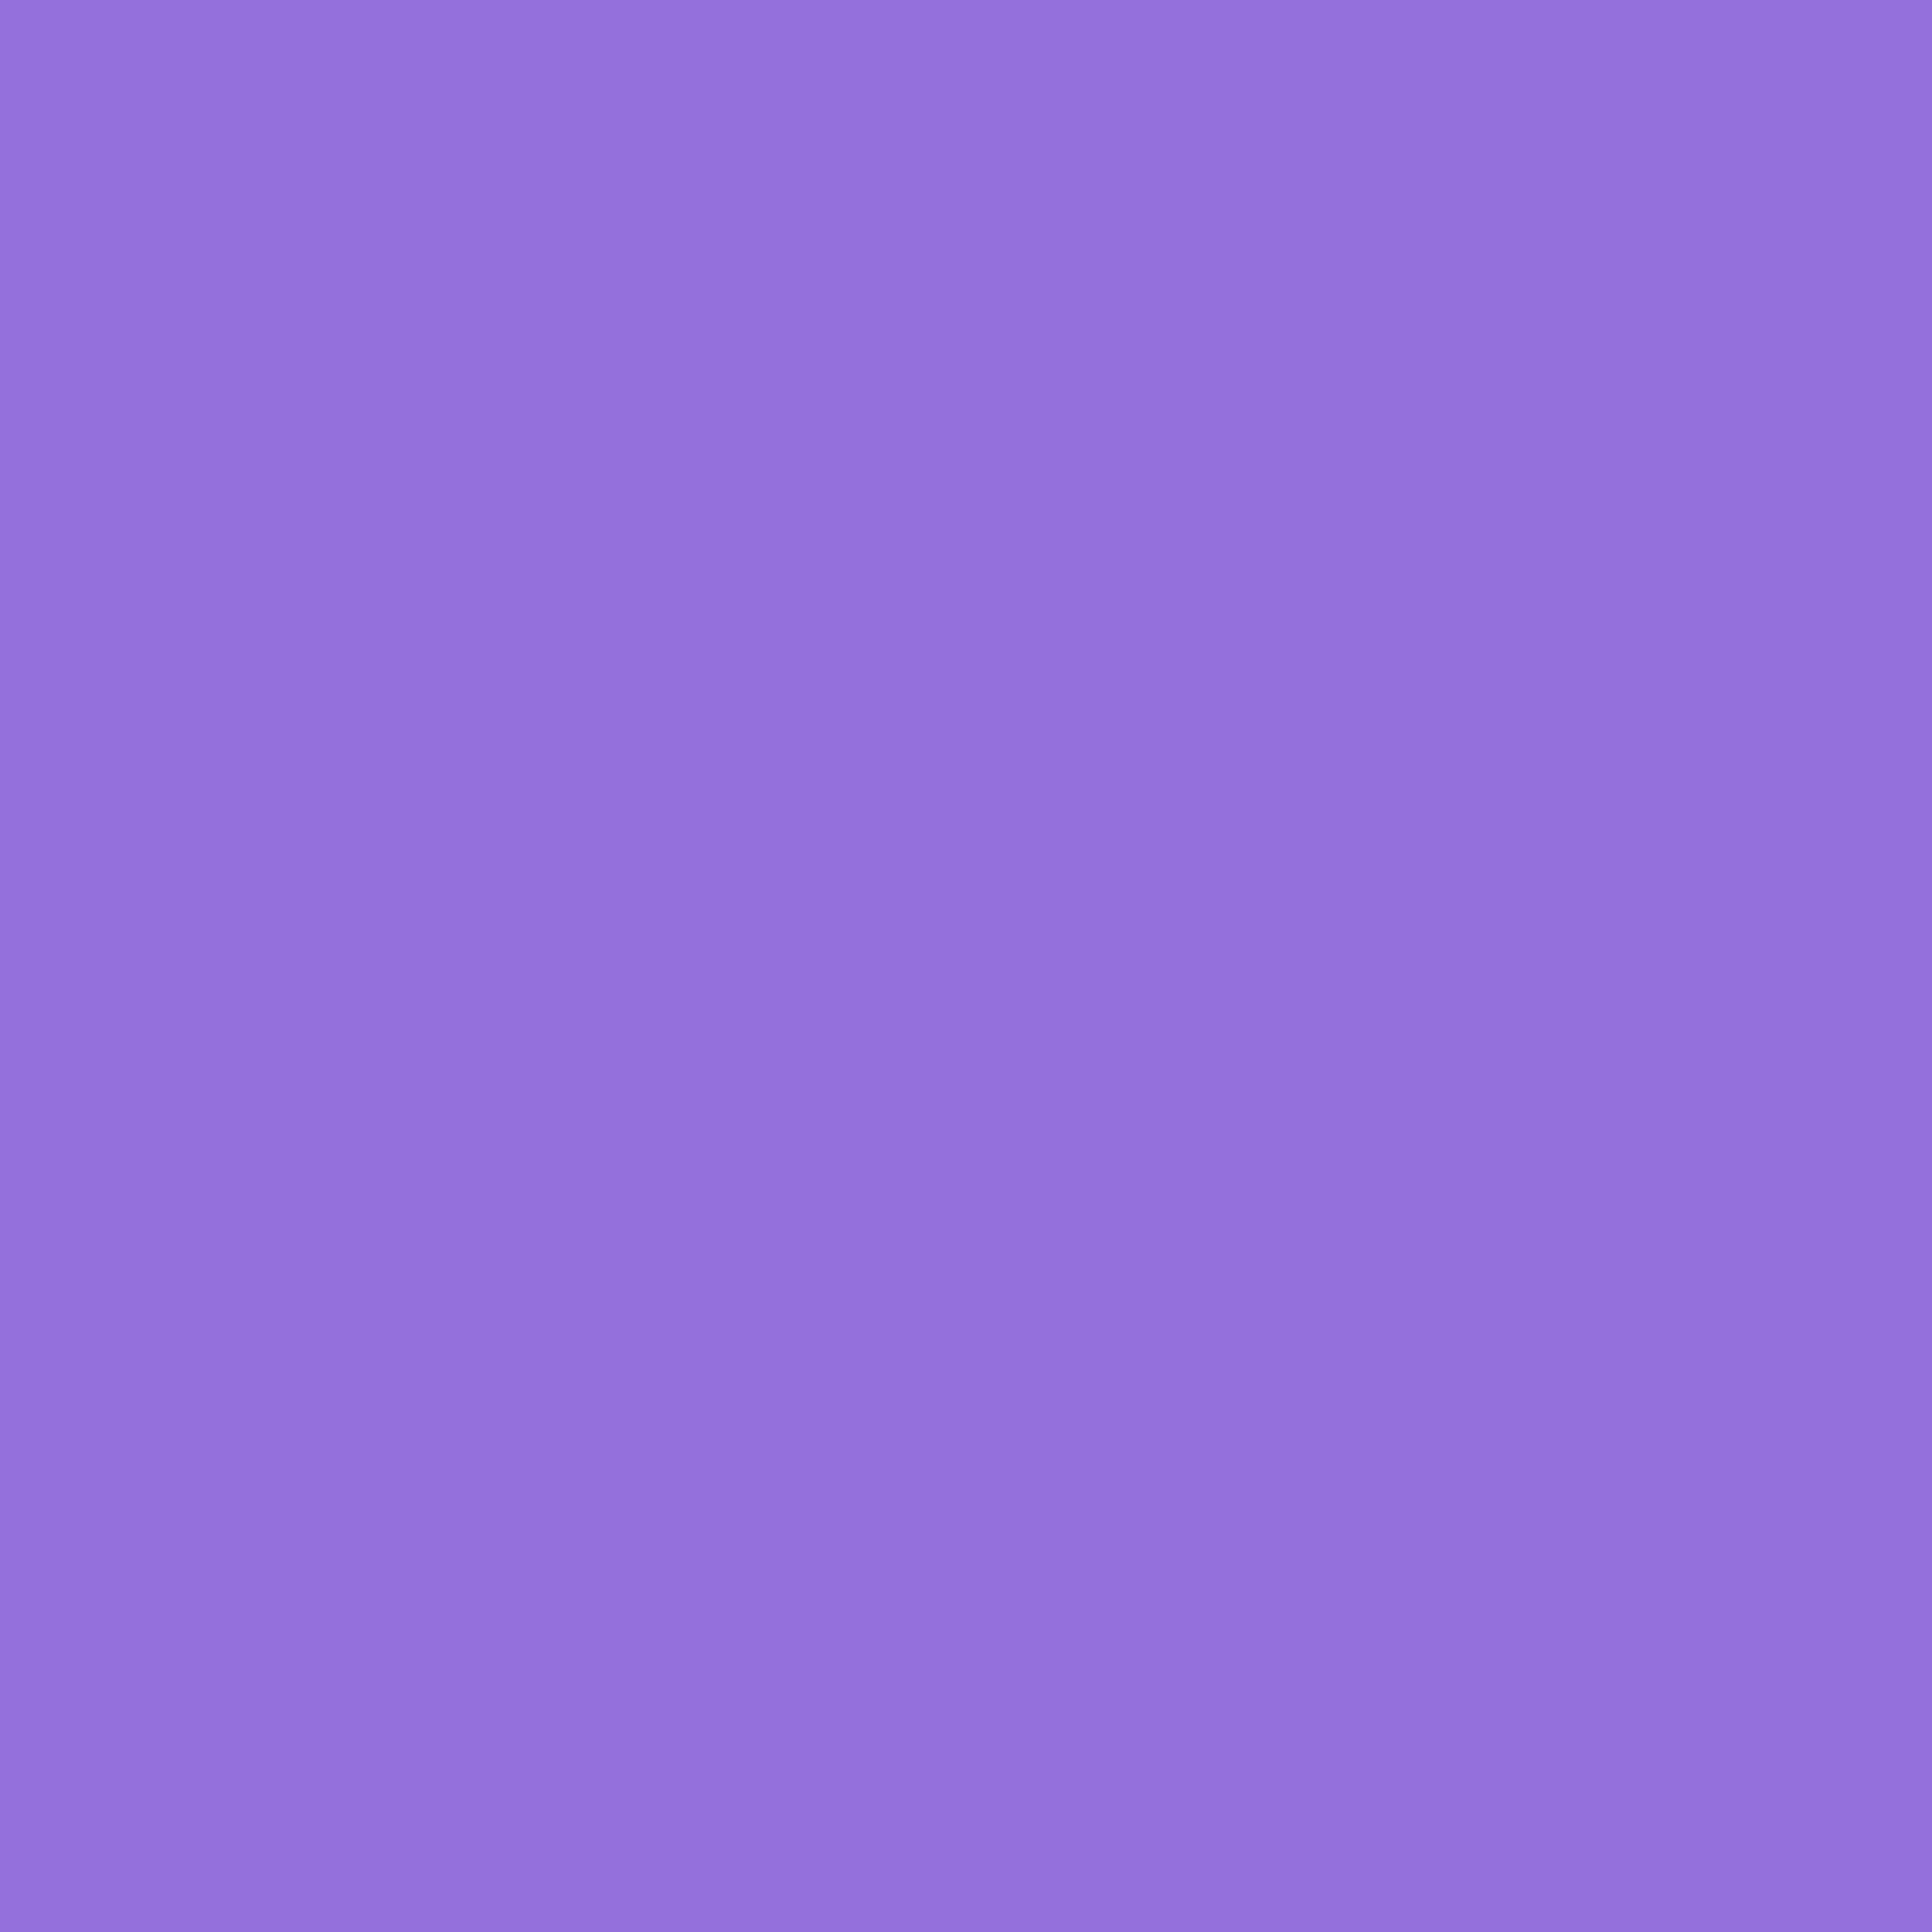 2732x2732 Medium Purple Solid Color Background